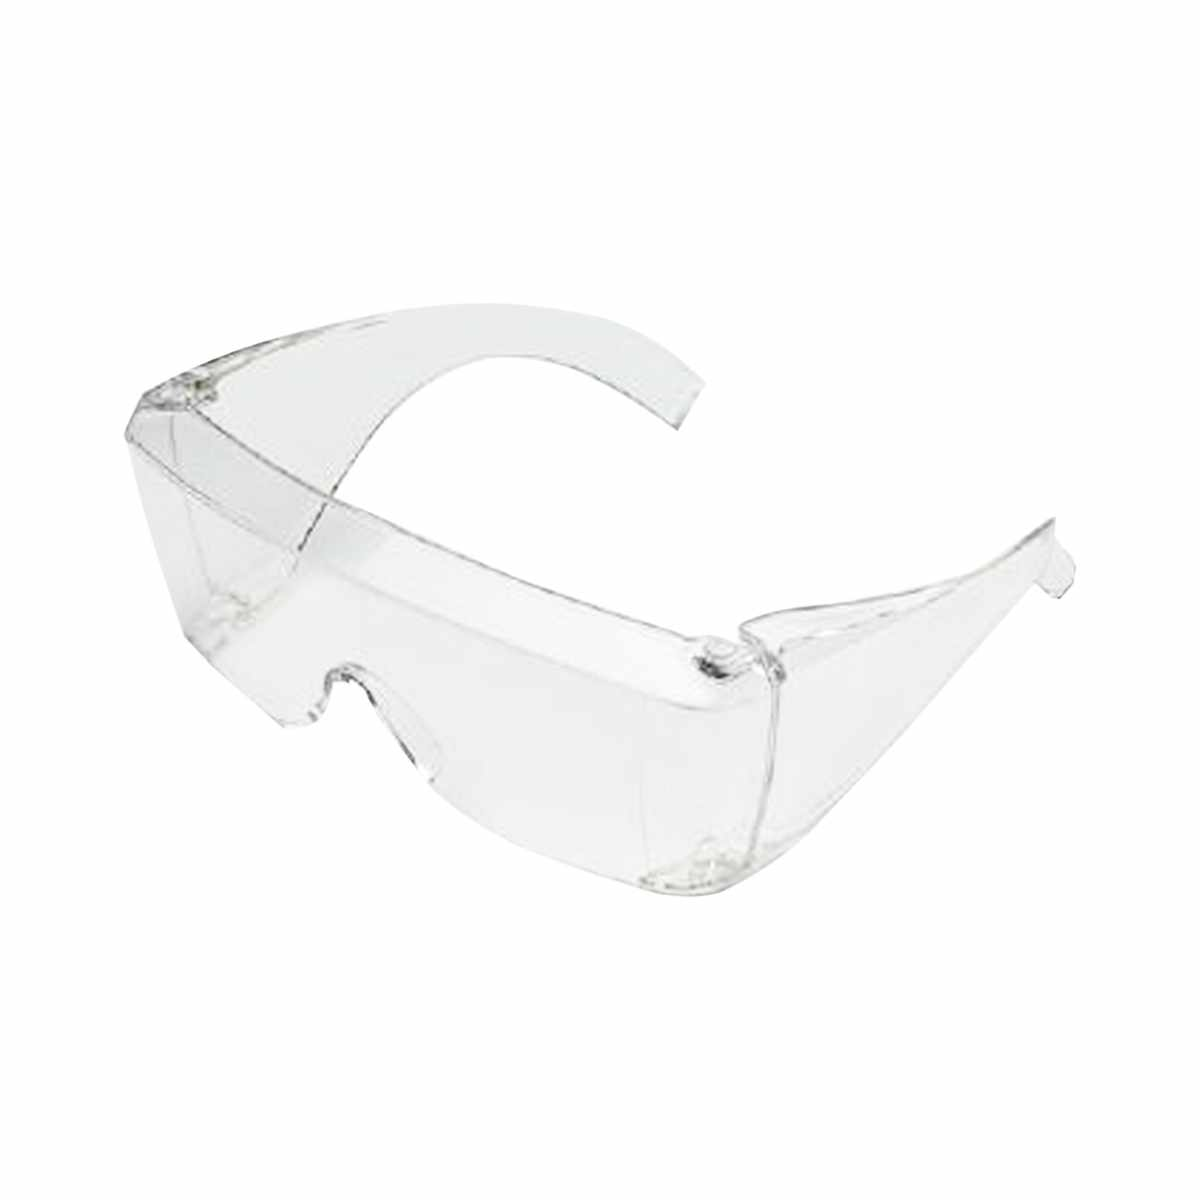 Ocushield Goggles